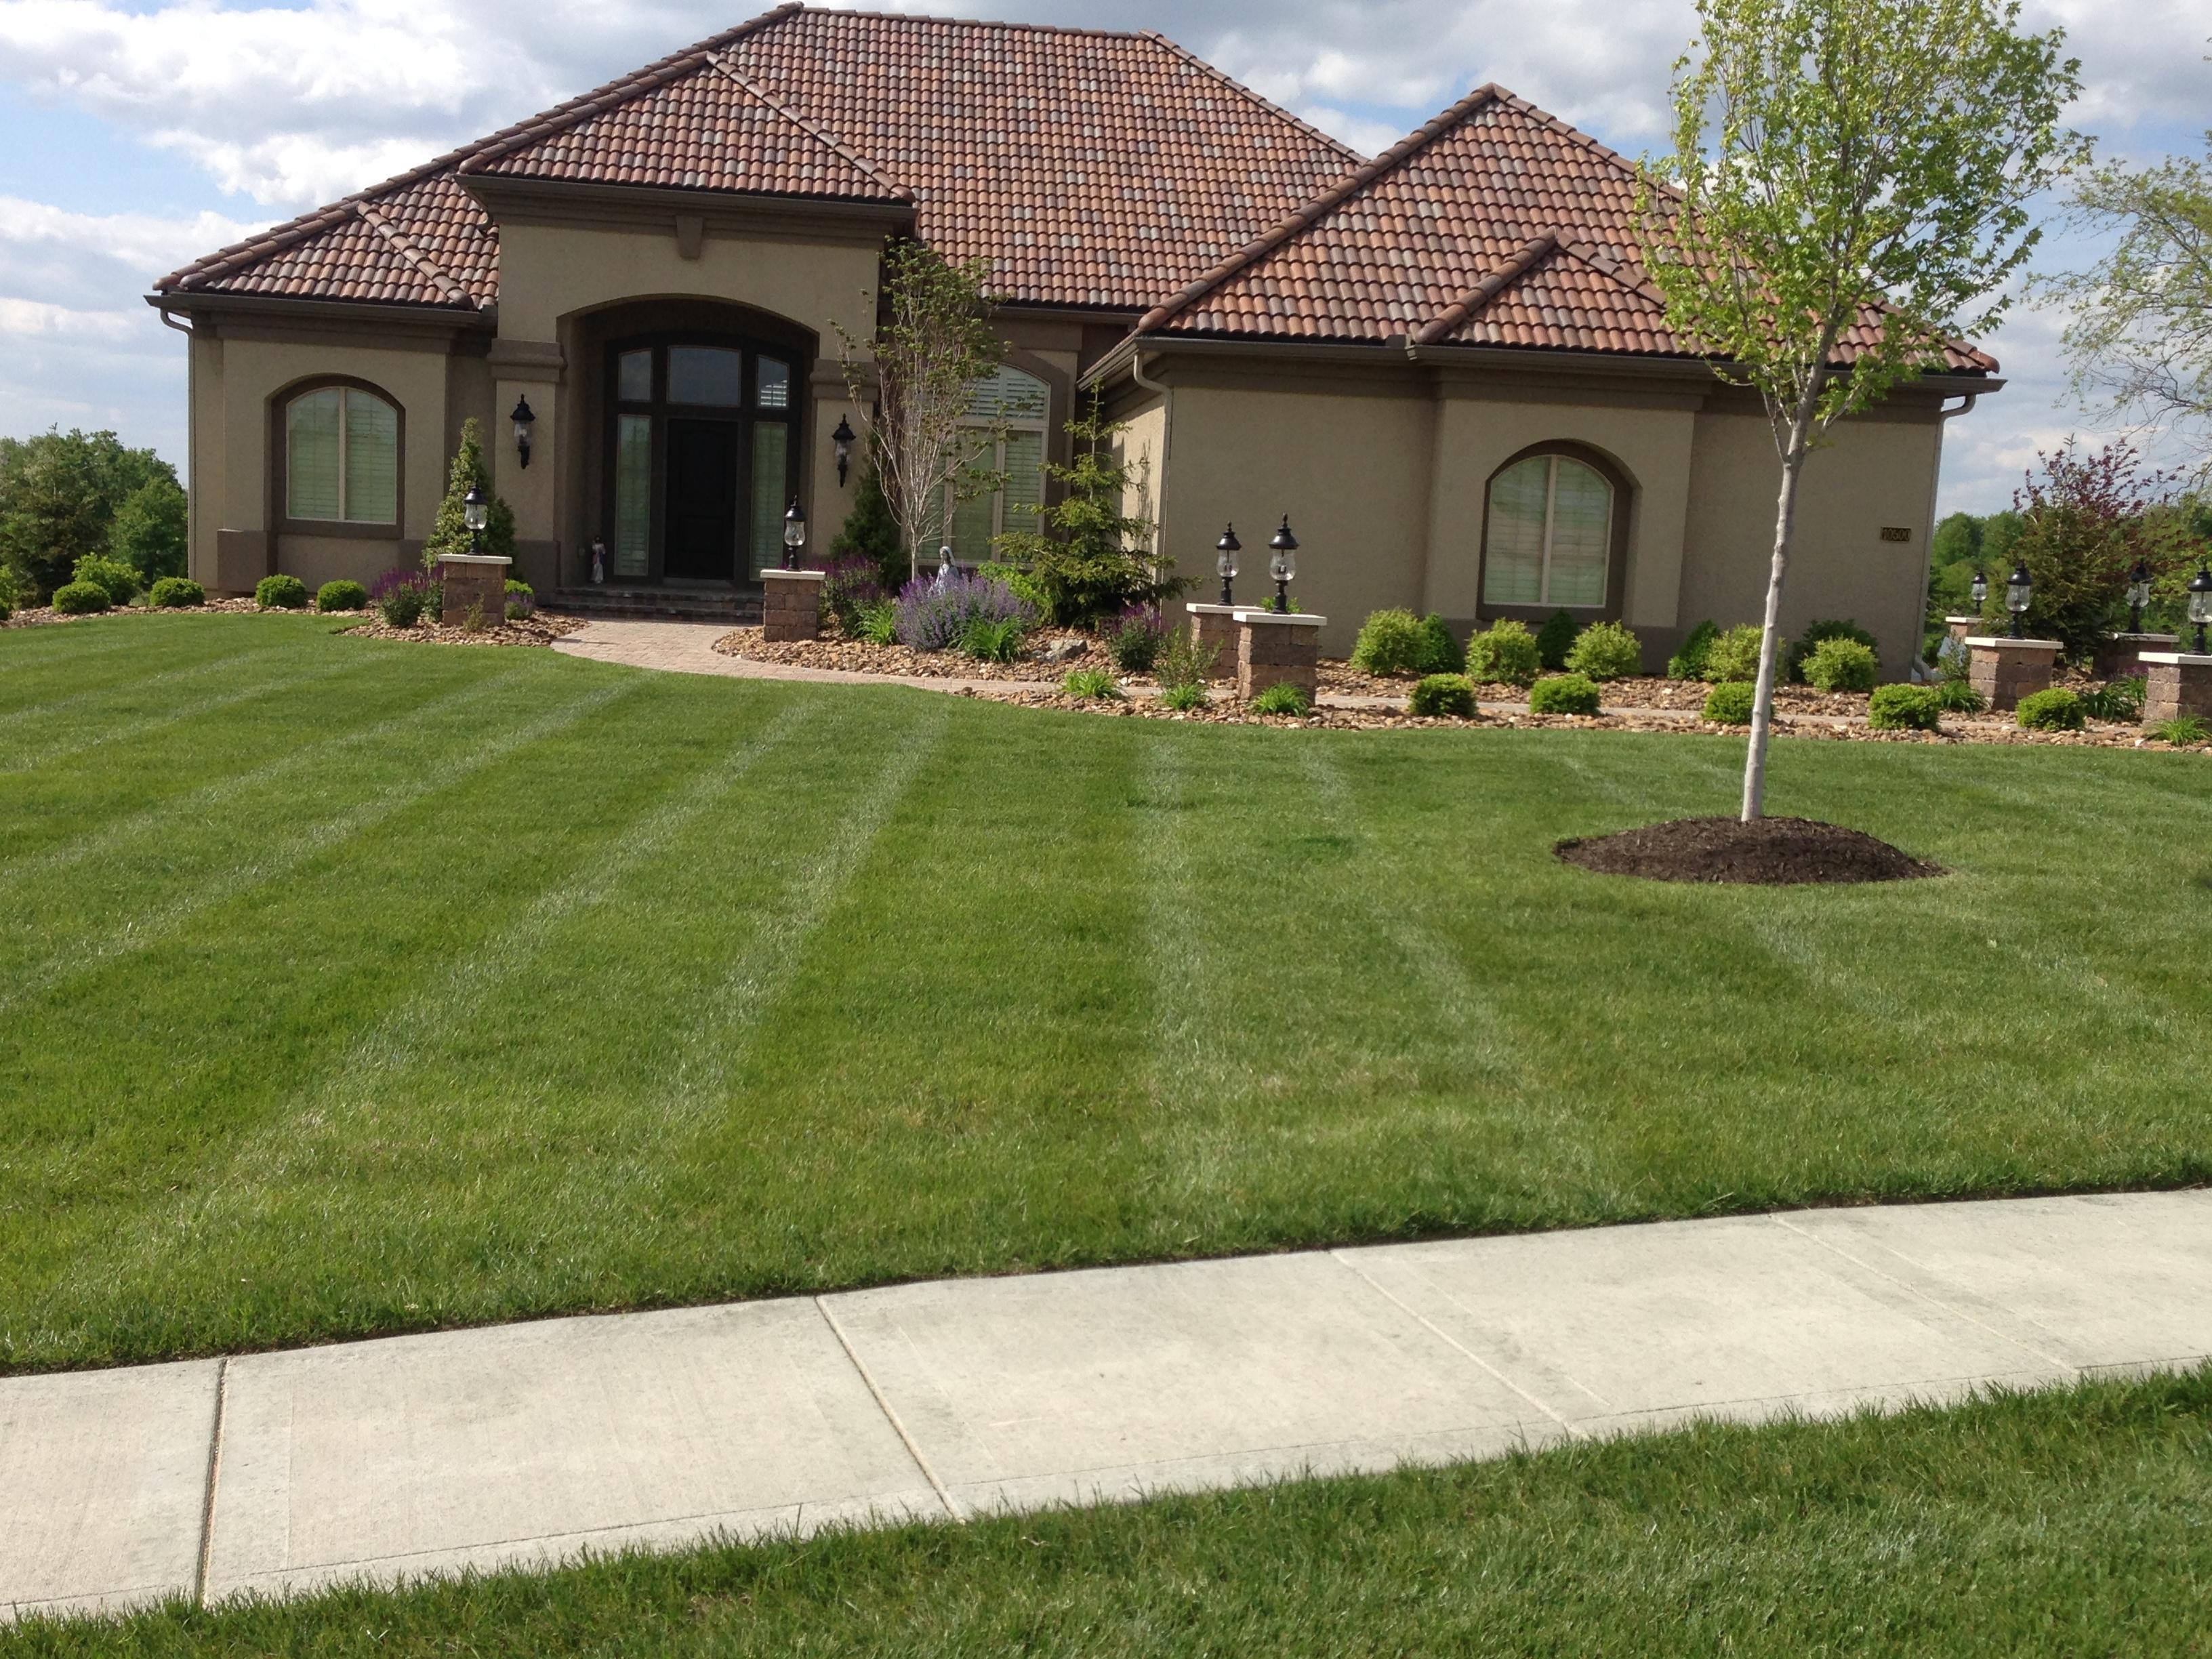 Bradford Street Lawn & Landscaping, LLC image 5